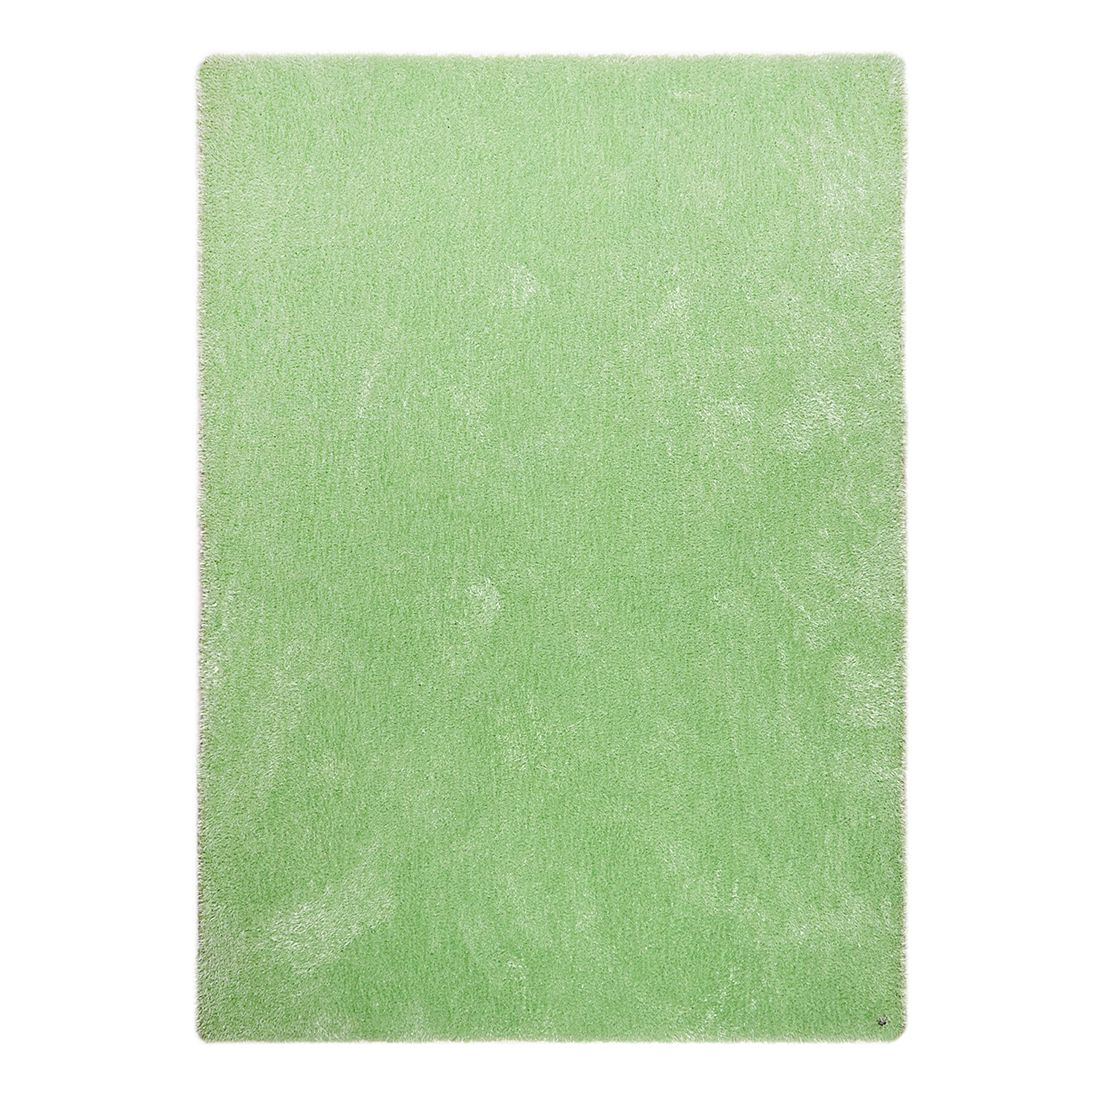 Tapijt Soft Square - mintgroen - maat: 190x190cm, Tom Tailor